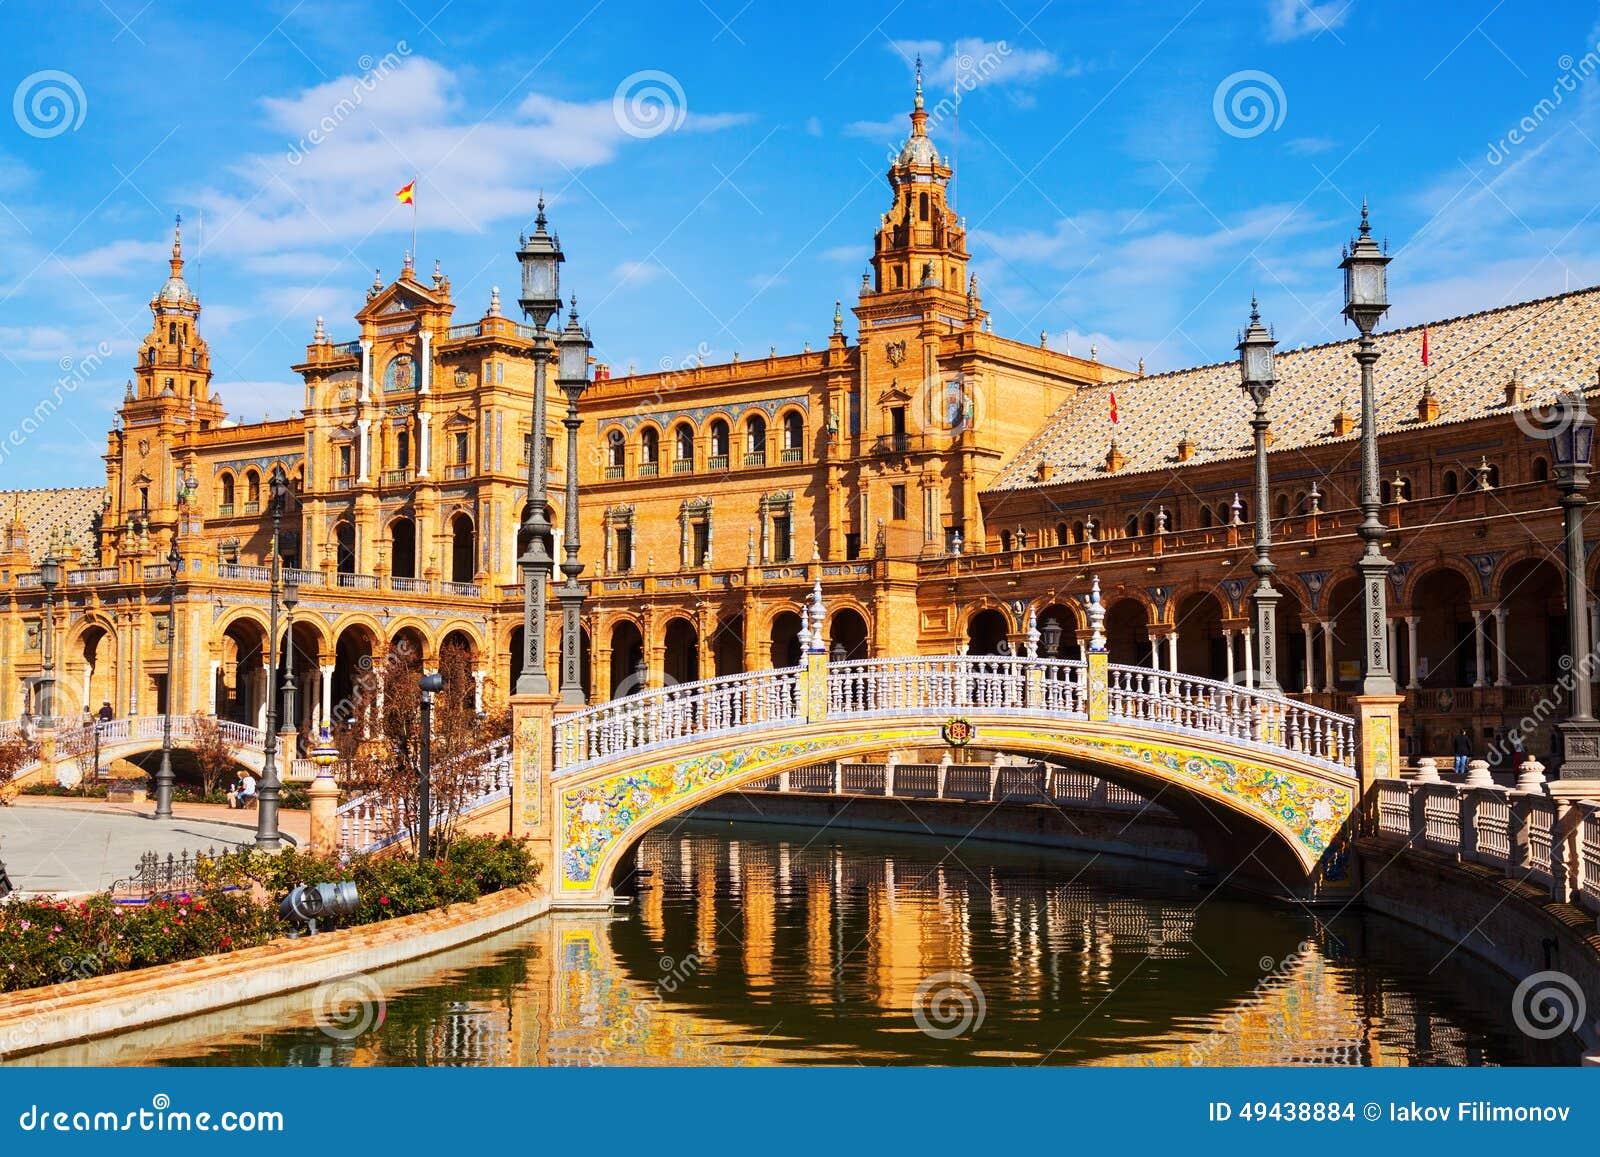 Download сentral Building And Bridge At Plaza De Espana. Sevilla, Spain Stock Photo - Image of parque, landmarks: 49438884